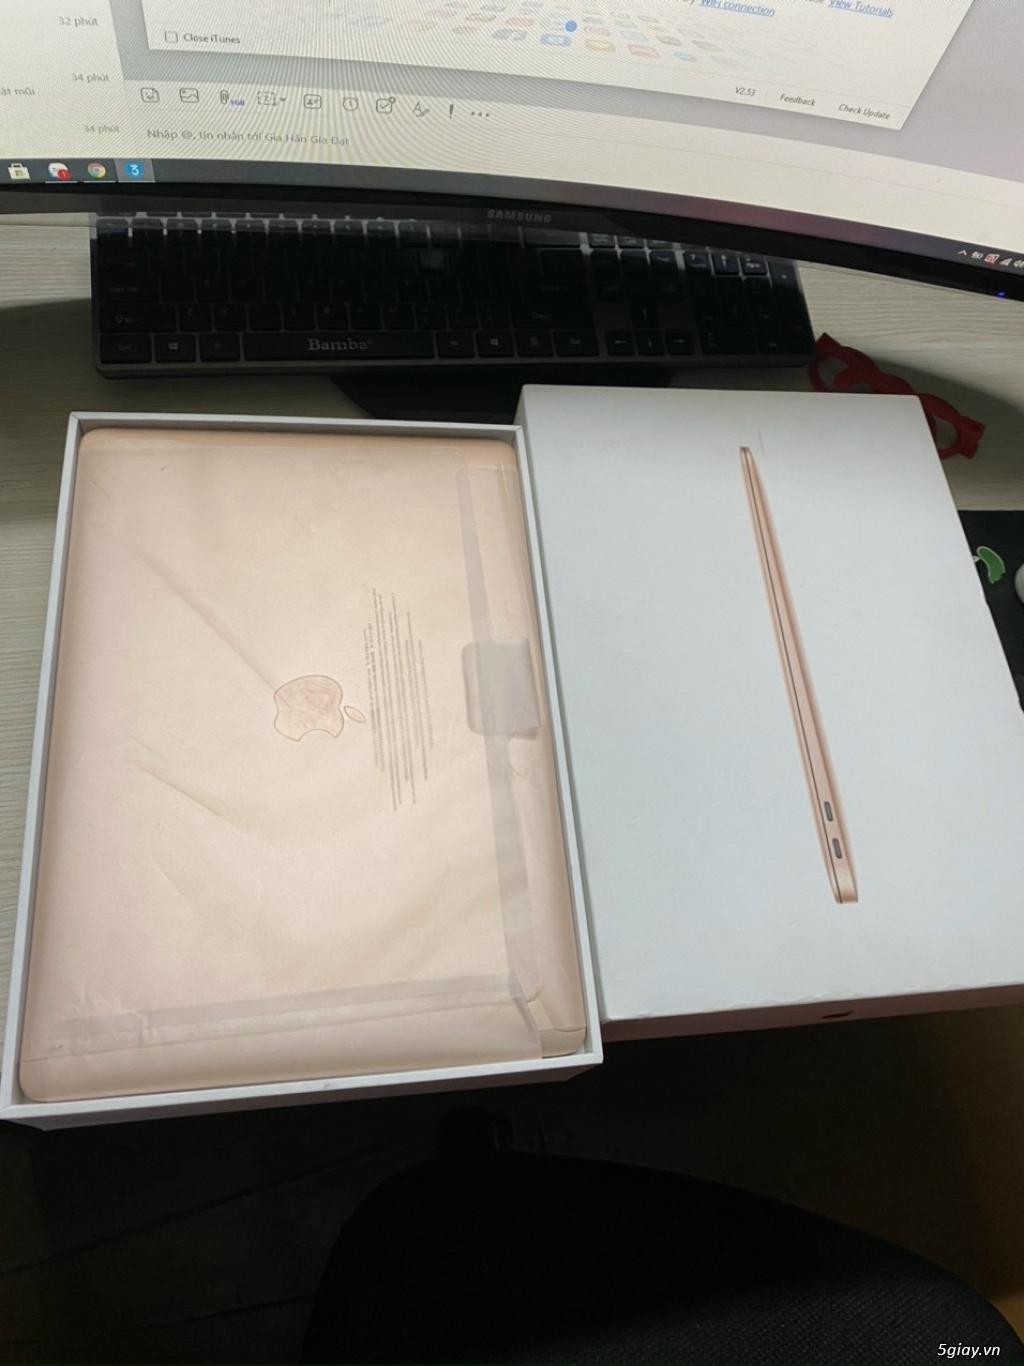 MacBook Air 13 inch 2018 màu gold fullbox đẹp keng 99%